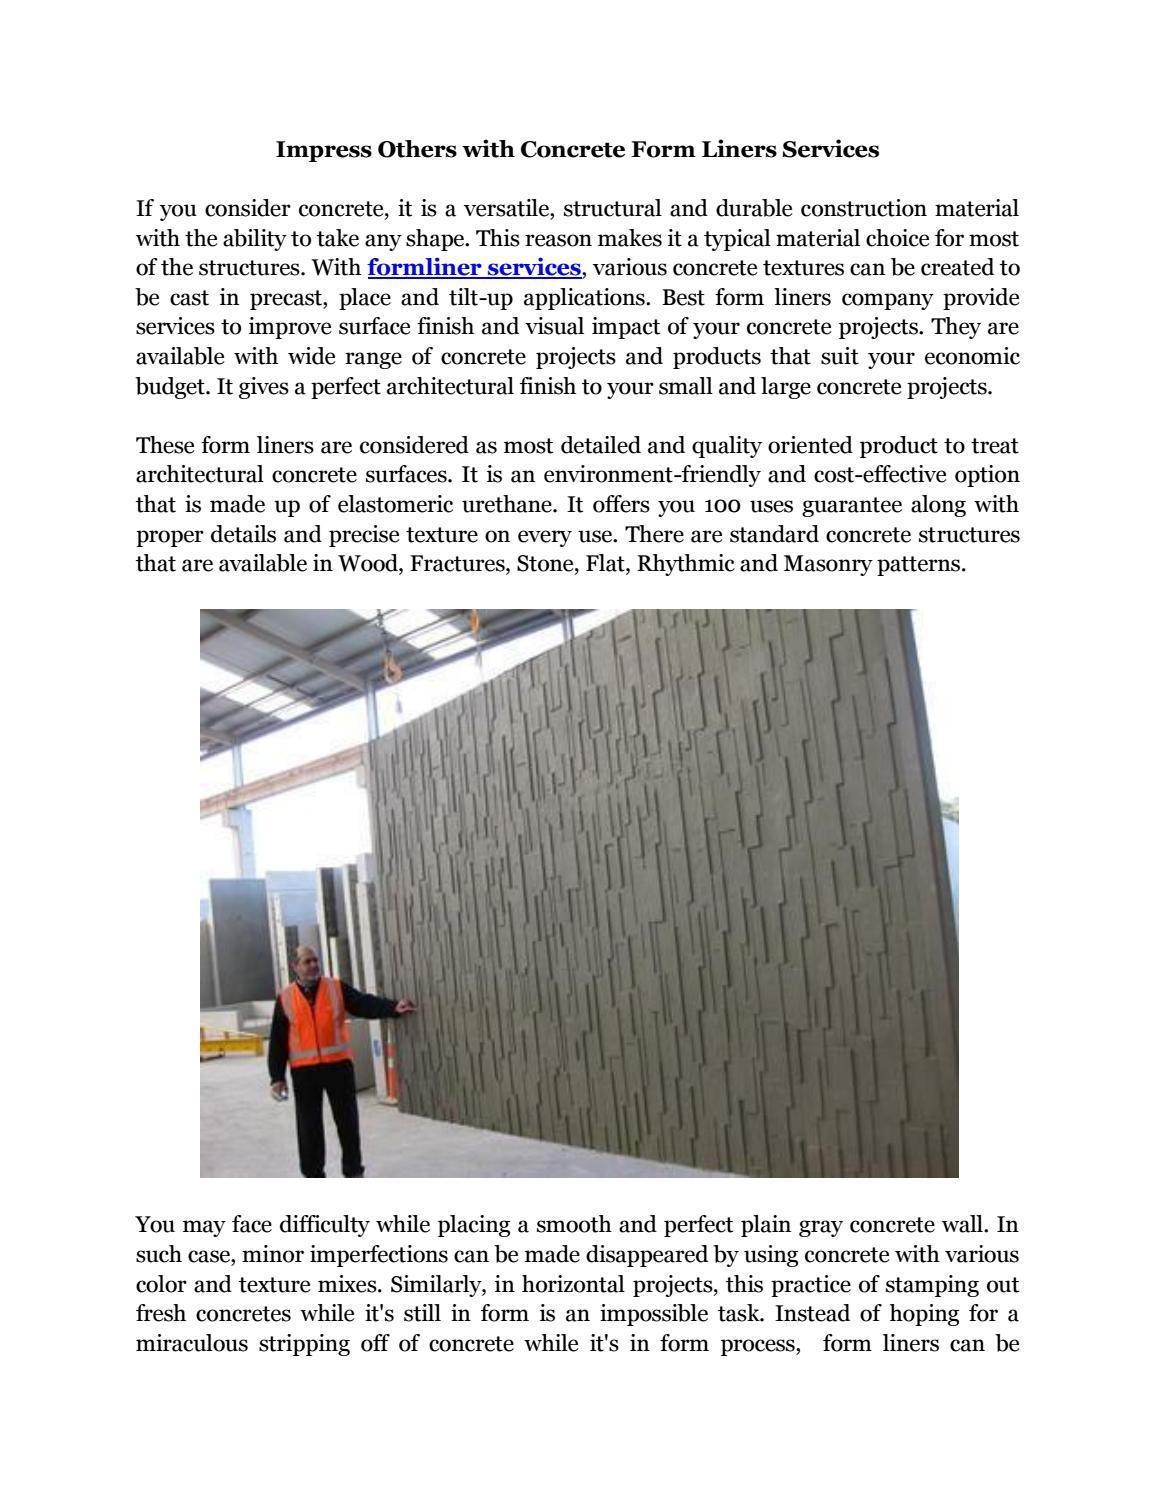 Custom Concrete Form Liners